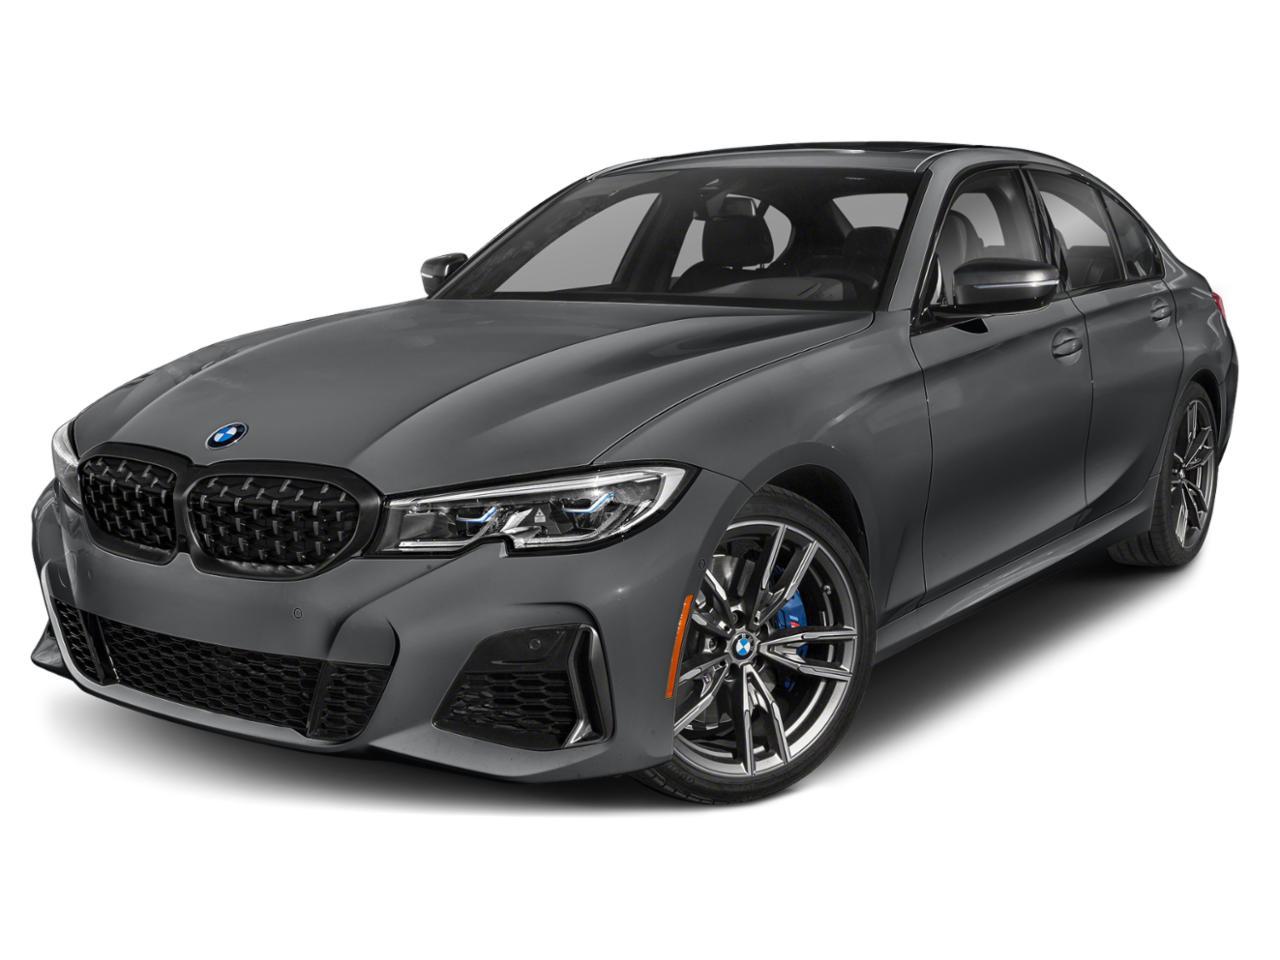 2021 BMW M340i Vehicle Photo in Grapevine, TX 76051